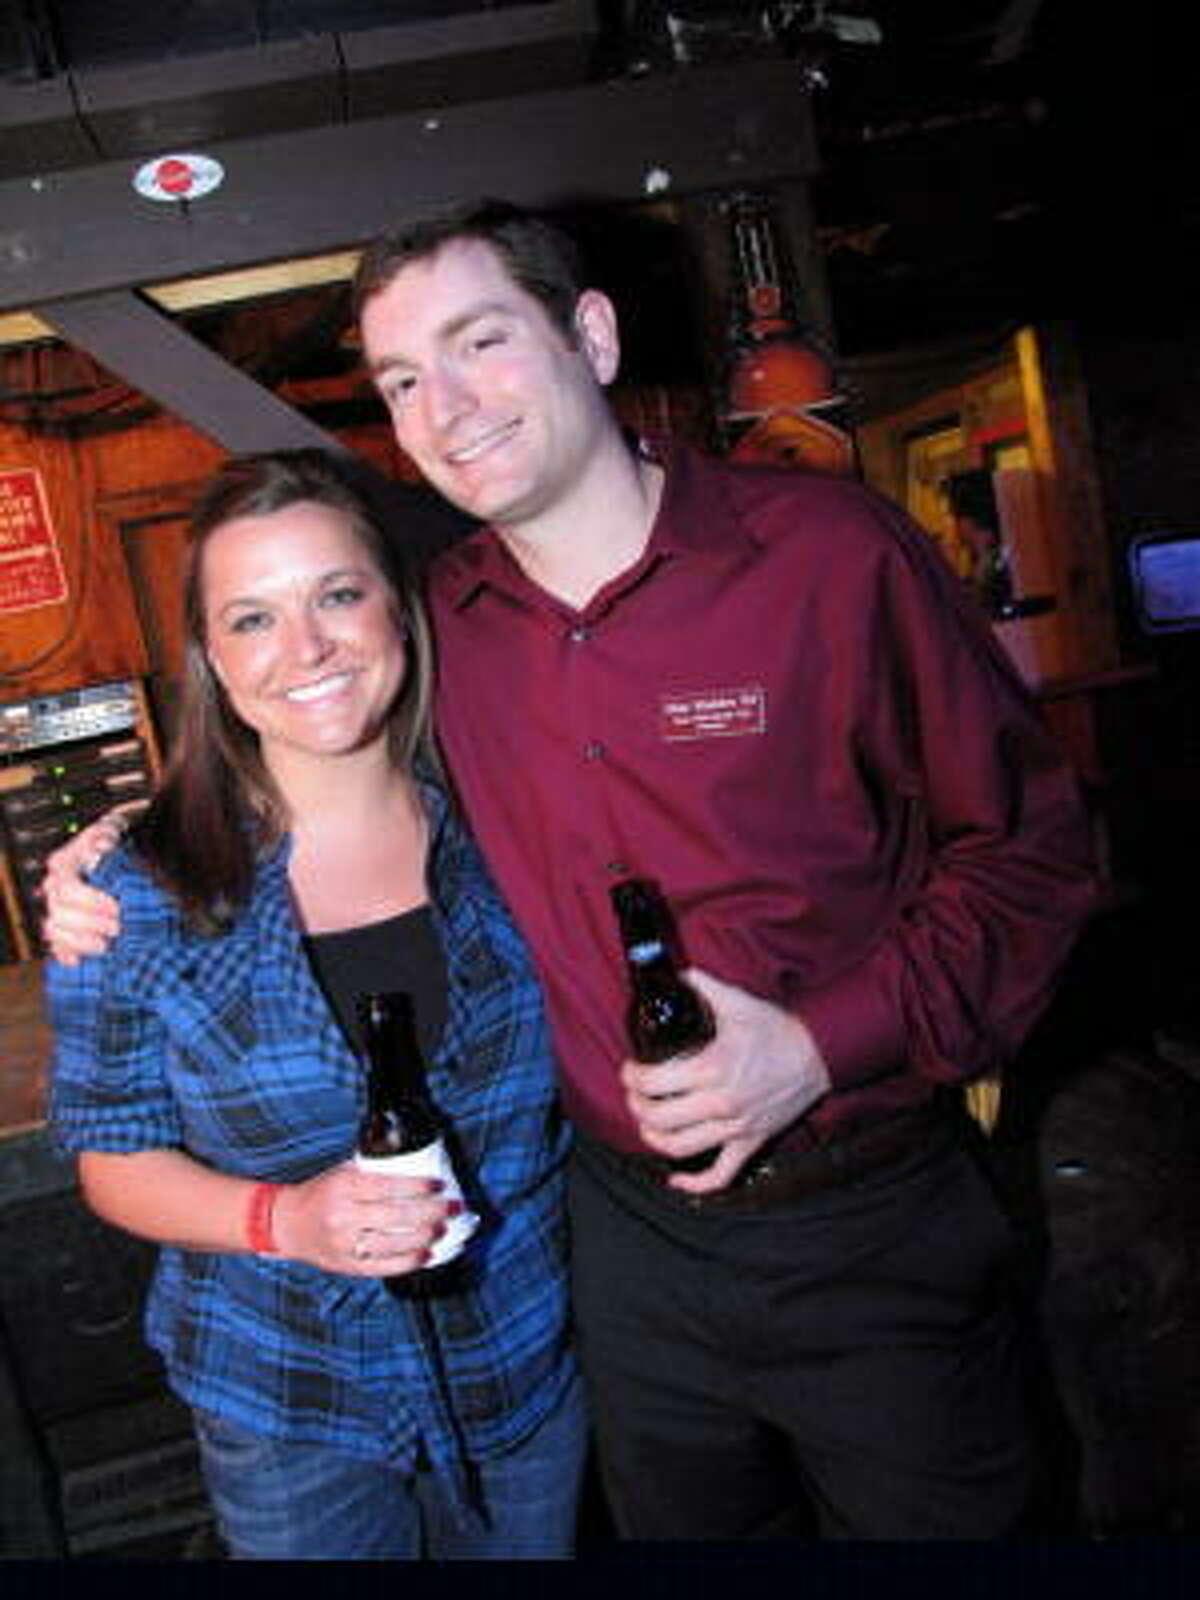 Ashley Cassel, left, and Matt Madox